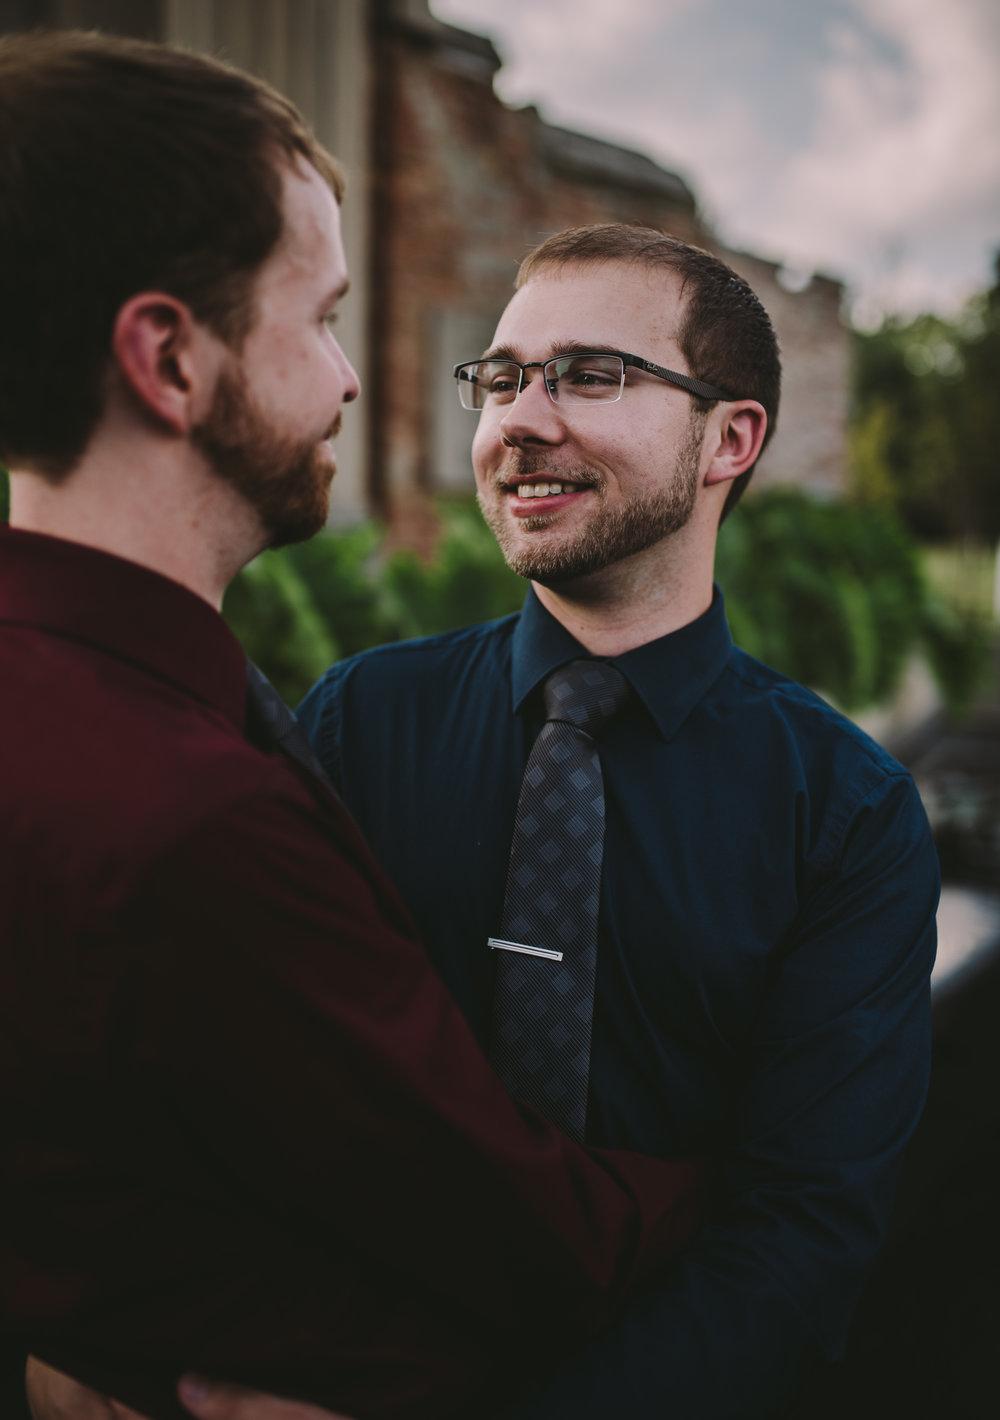 Brett+Christian_WeddingCeremony_September2017_IndianaWeddingPhotographer_SamanthaRosePhotography_-132.jpg